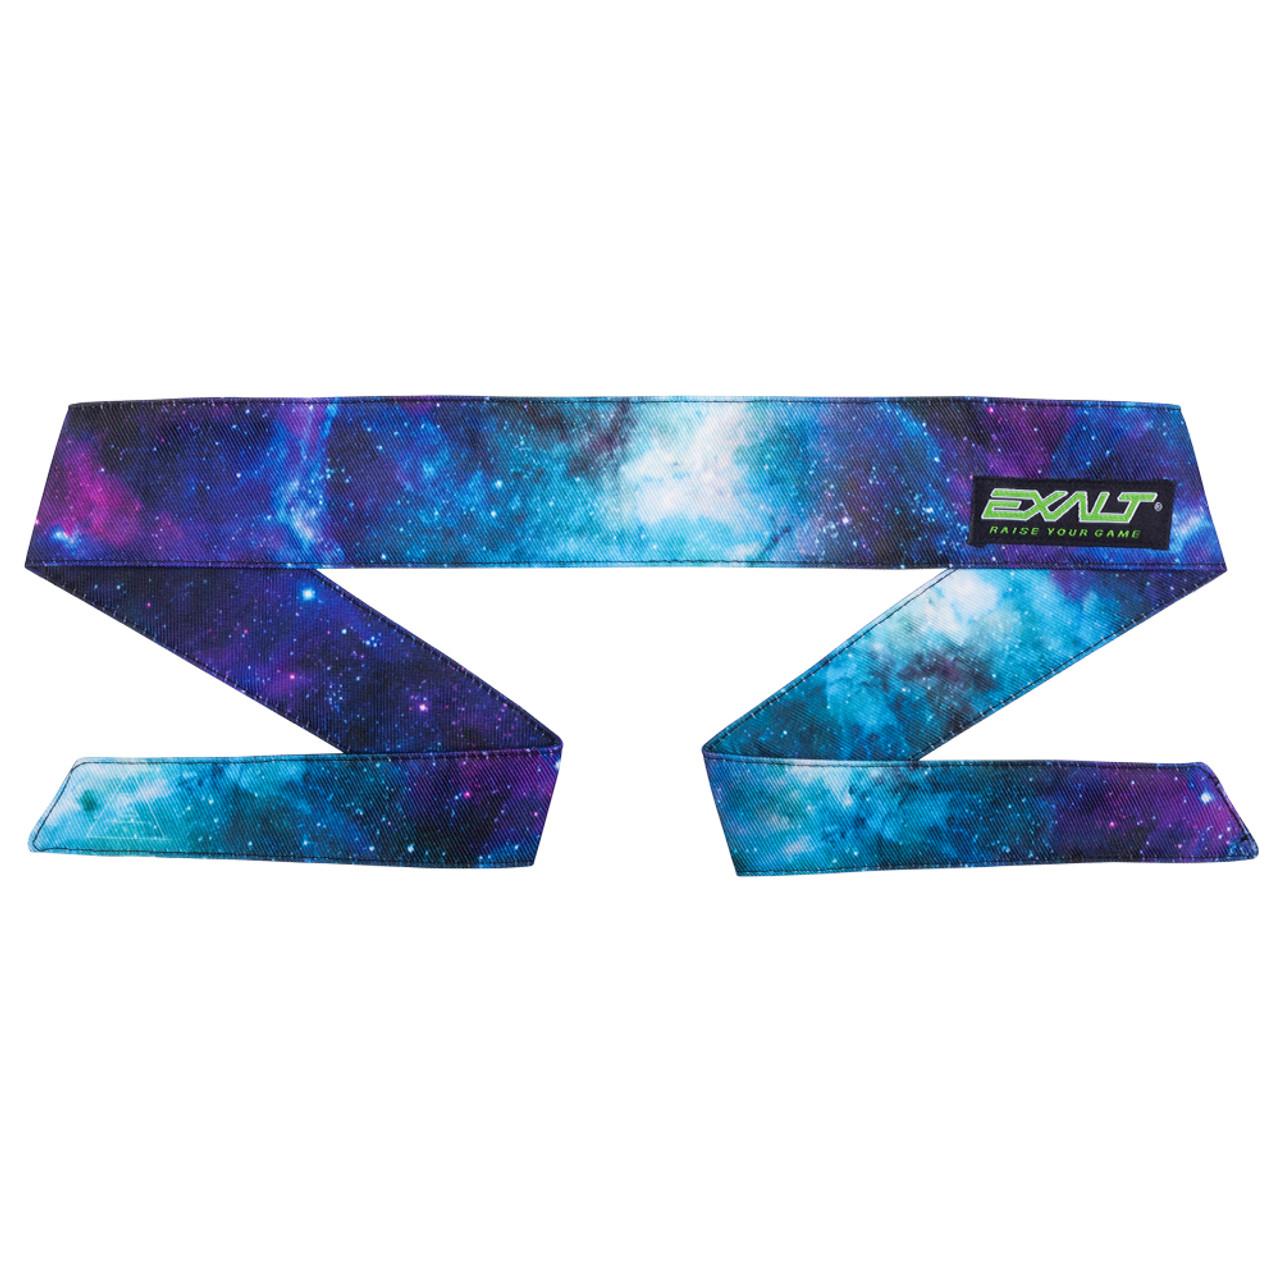 Exalt Headband / Cosmos